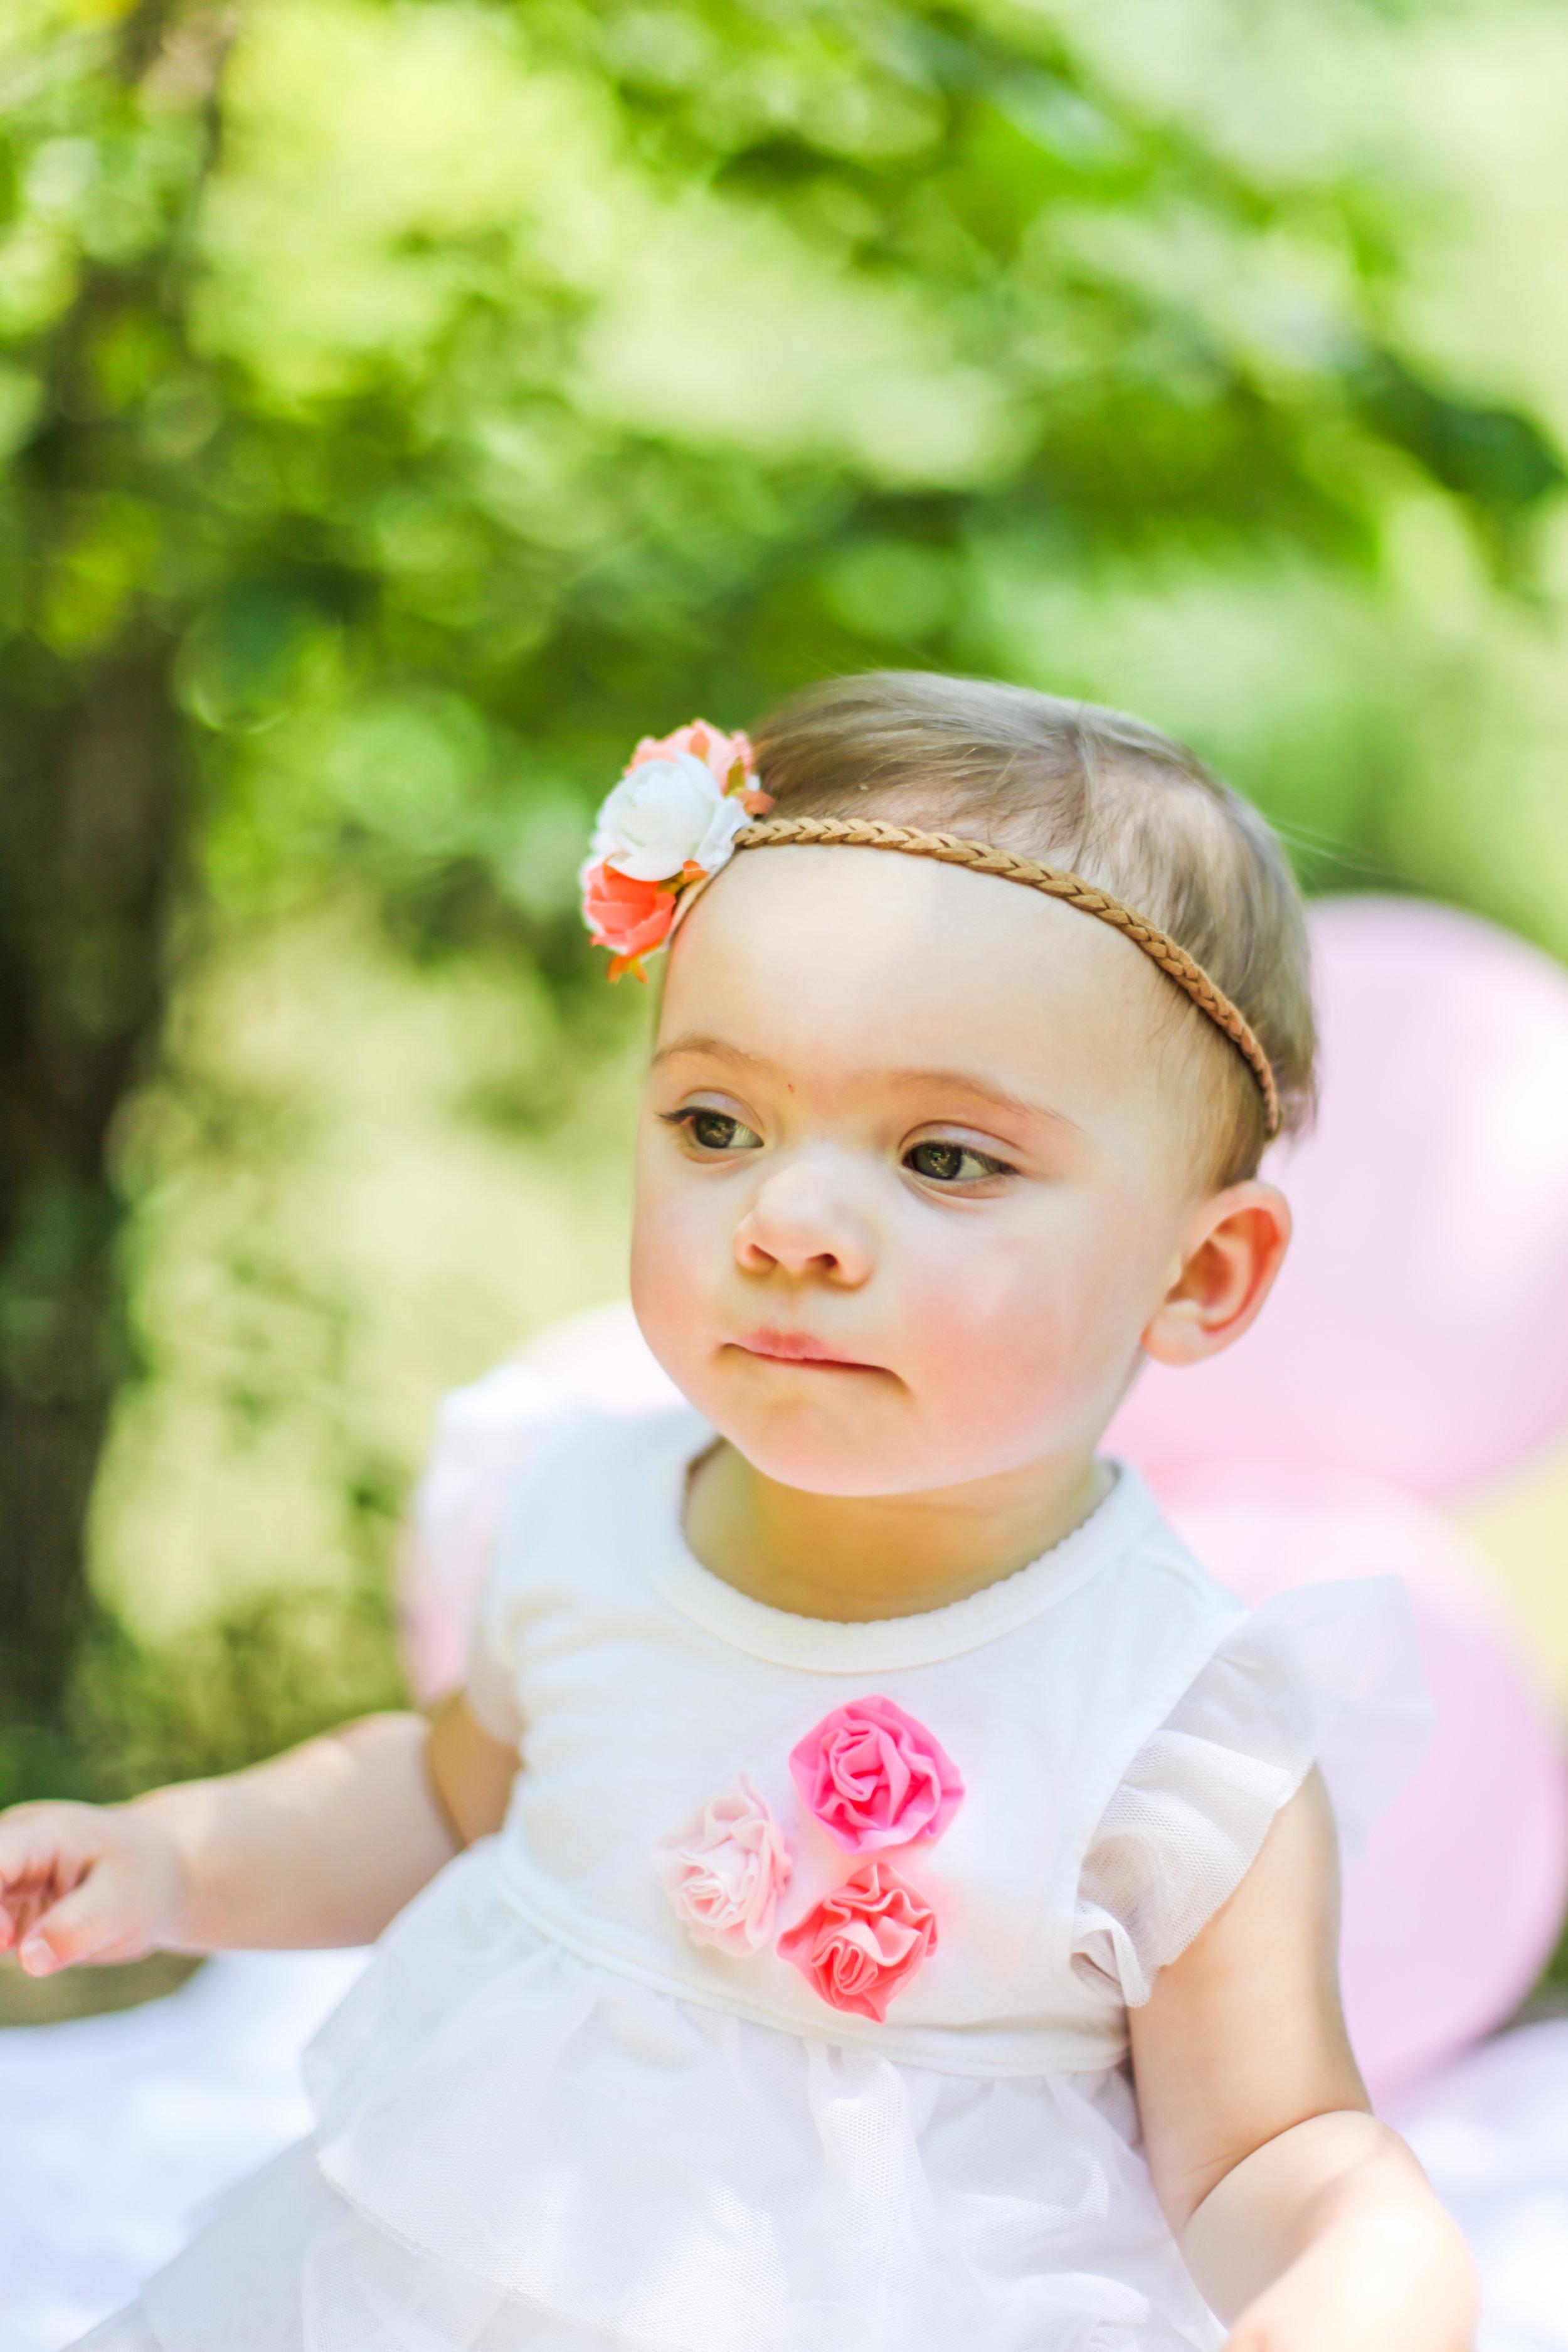 woodstock baby photography angela elliott-73.jpg